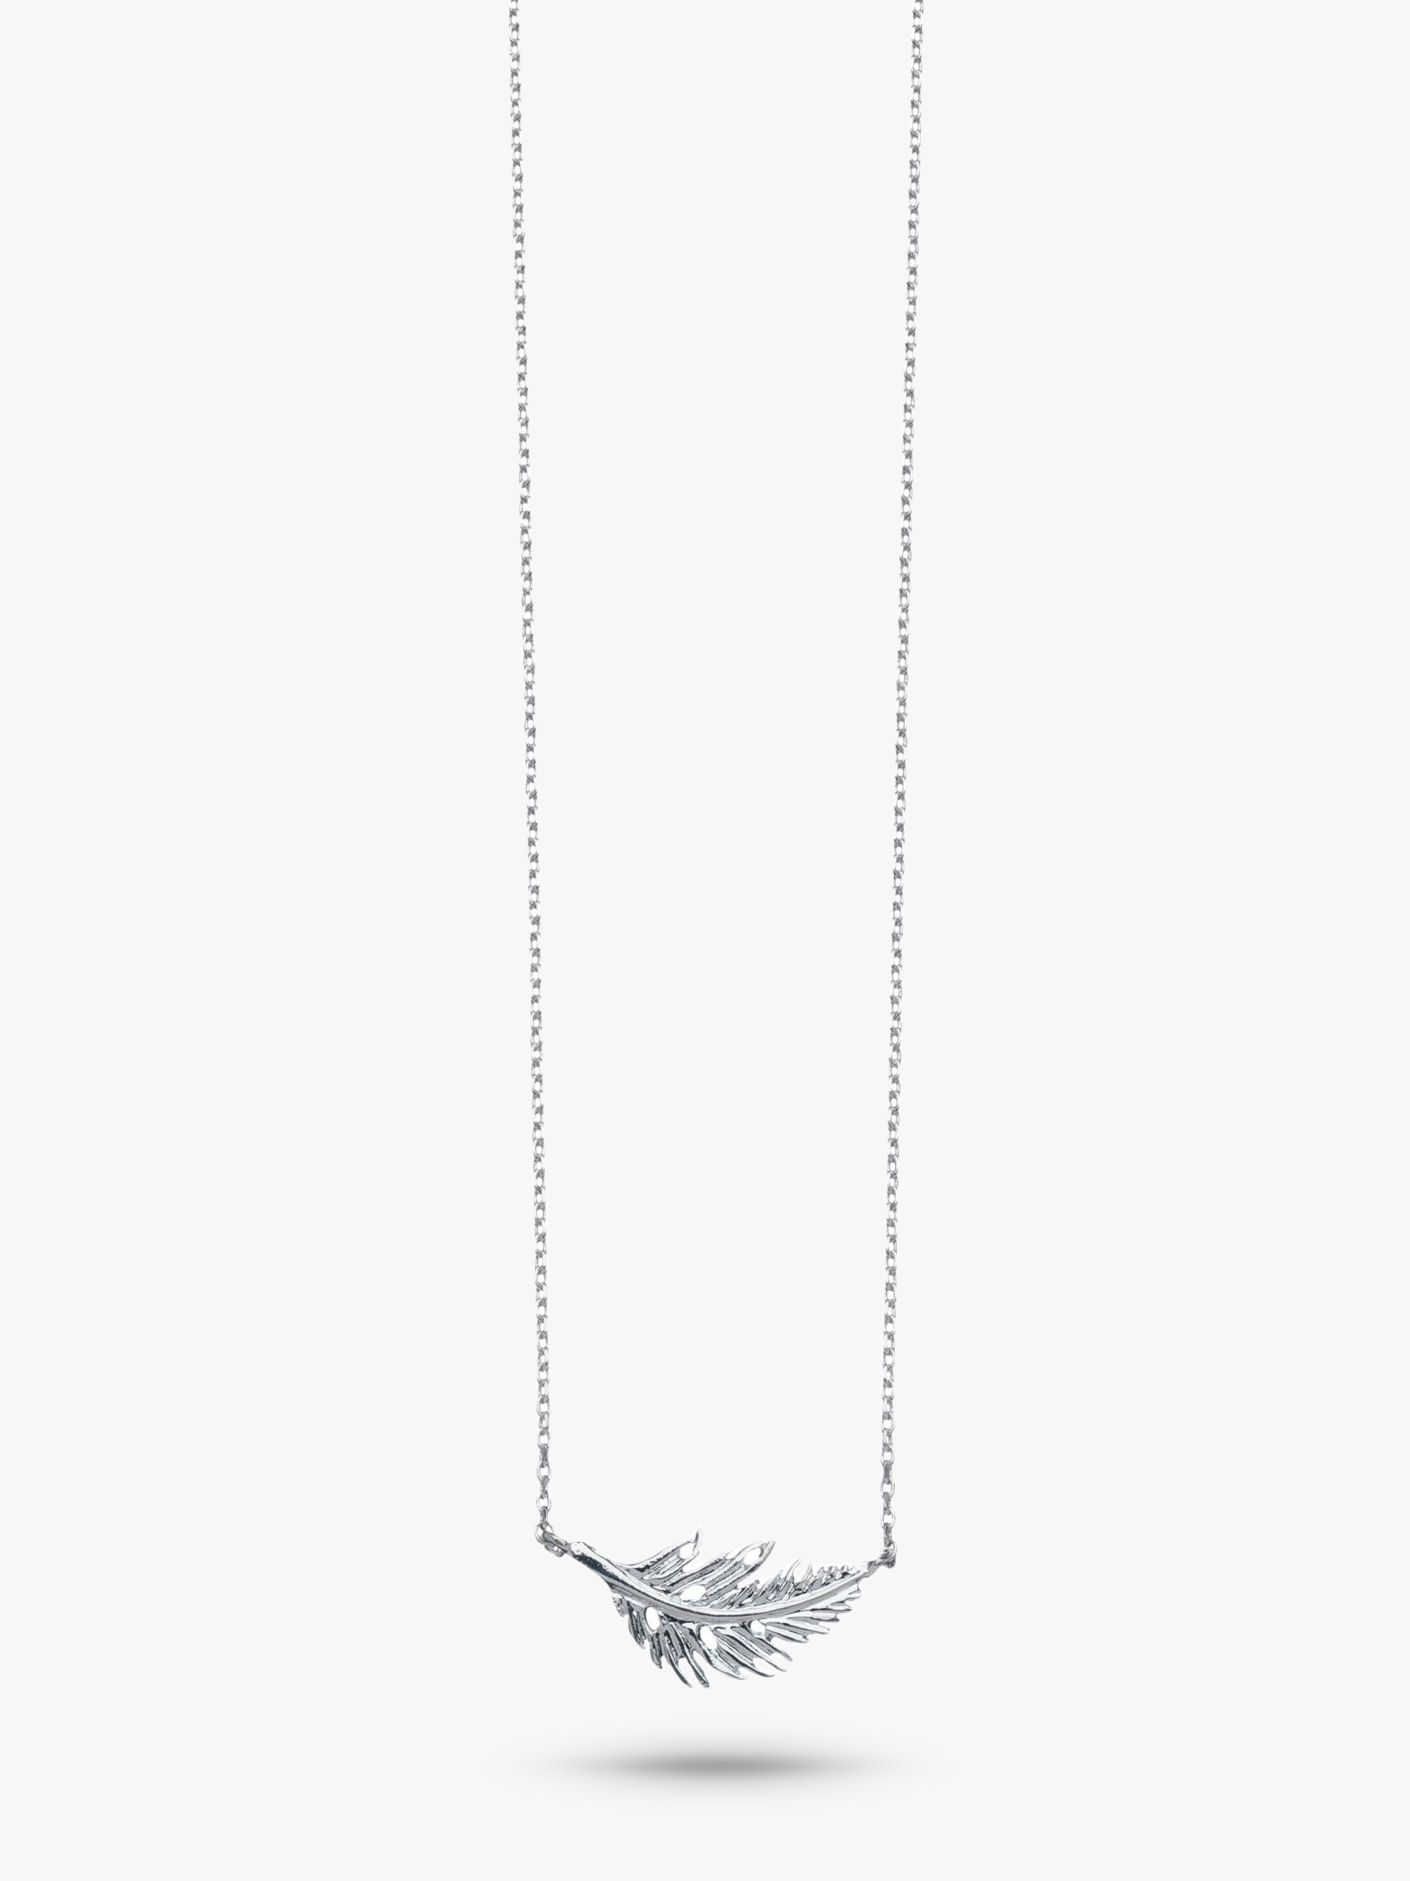 Estella Bartlett Estella Bartlett Feather Pendant Necklace, Silver